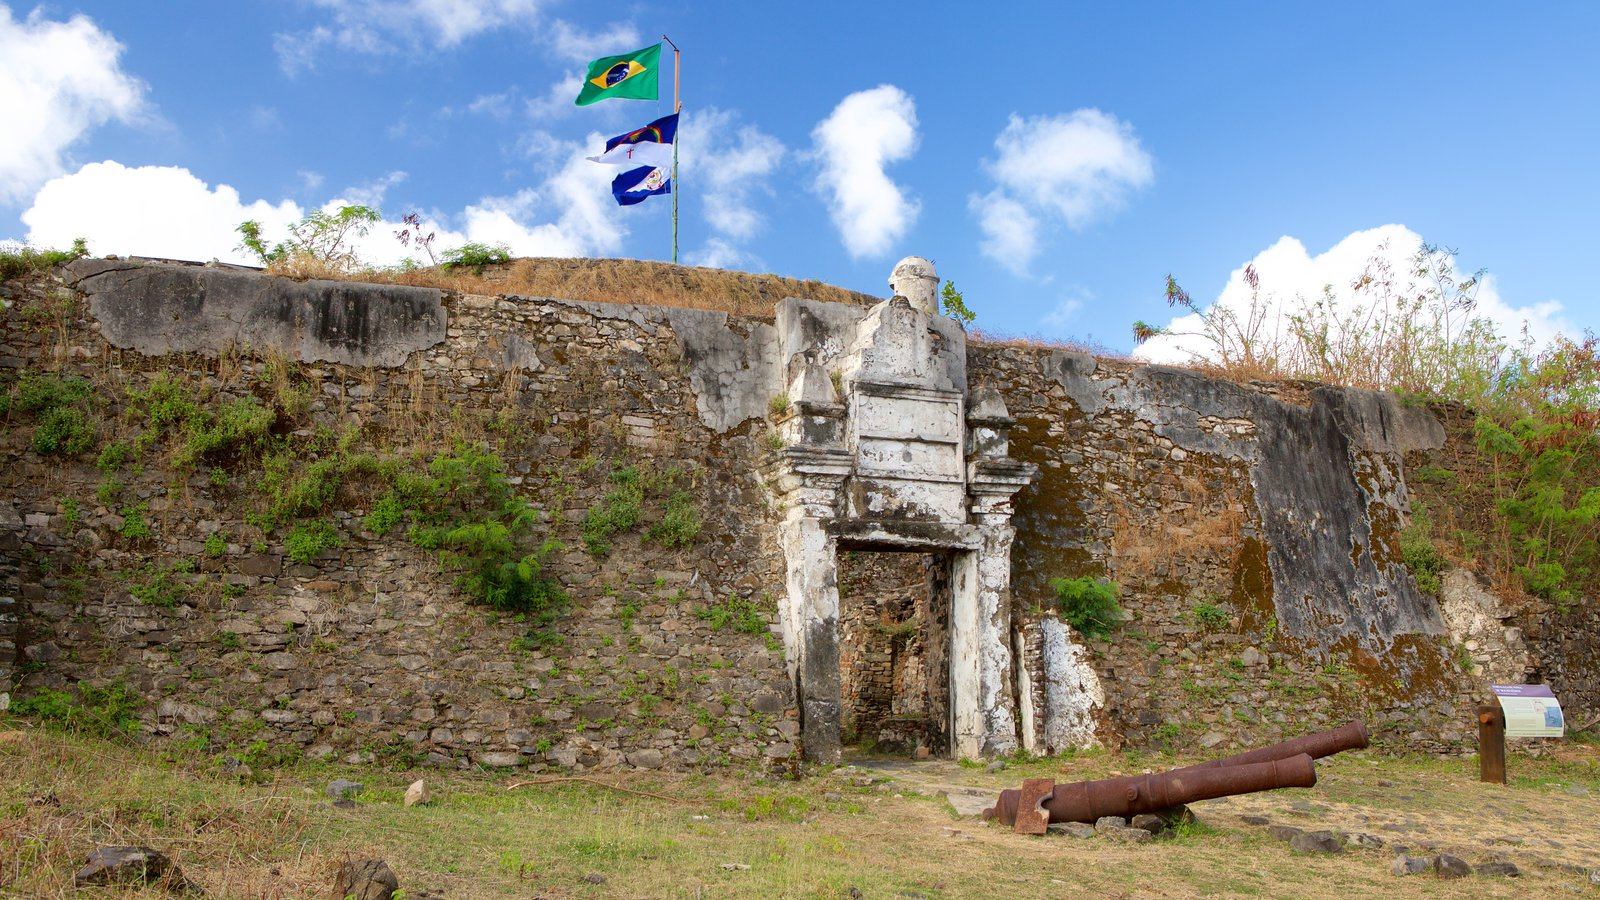 Forte dos Remédios caracterizando ruínas de edifício e itens militares